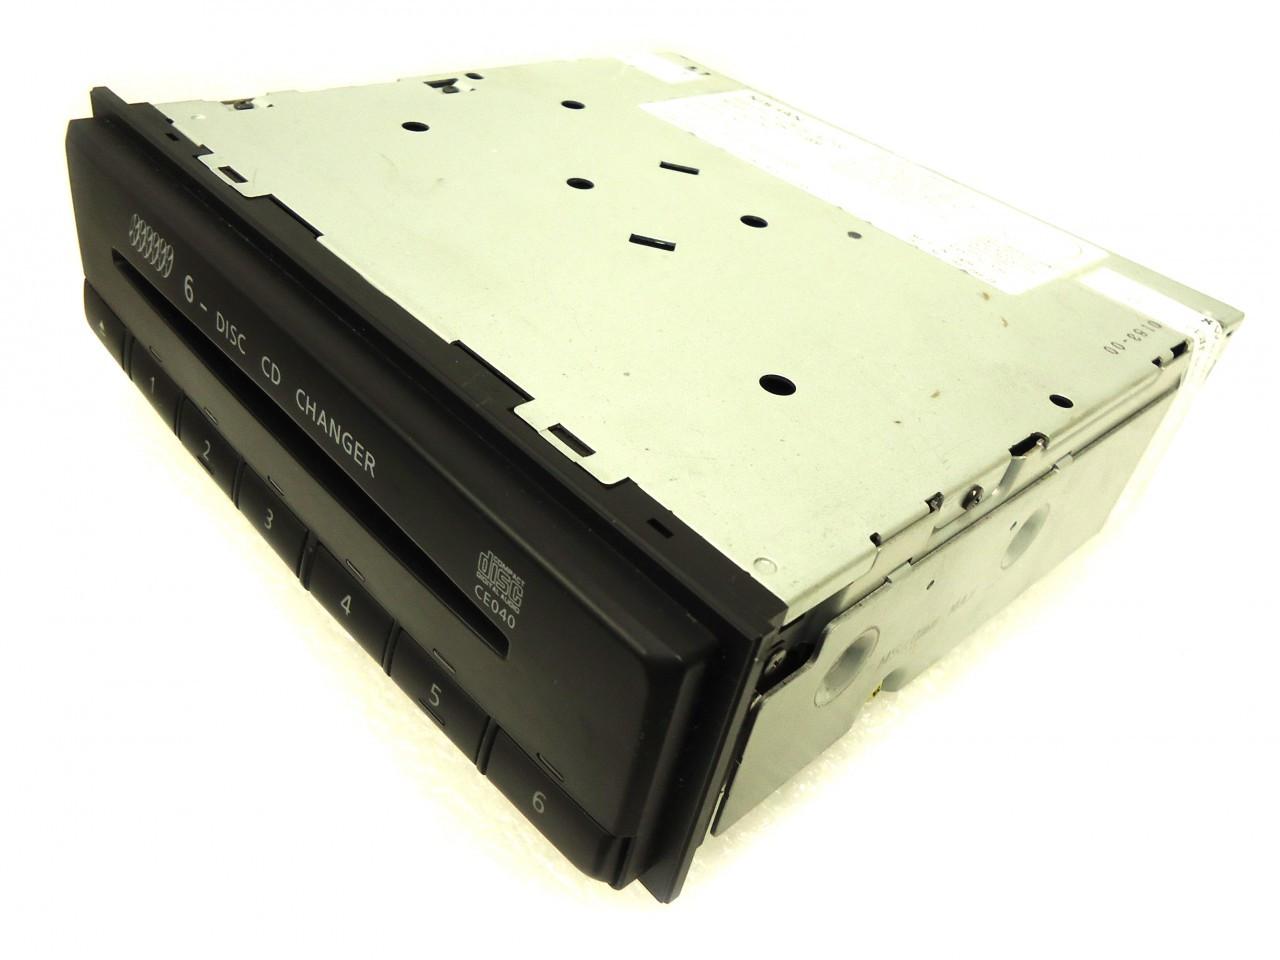 NISSAN Sentra Remote 6 Disc Changer CD Player CE040 2004 2005 2006